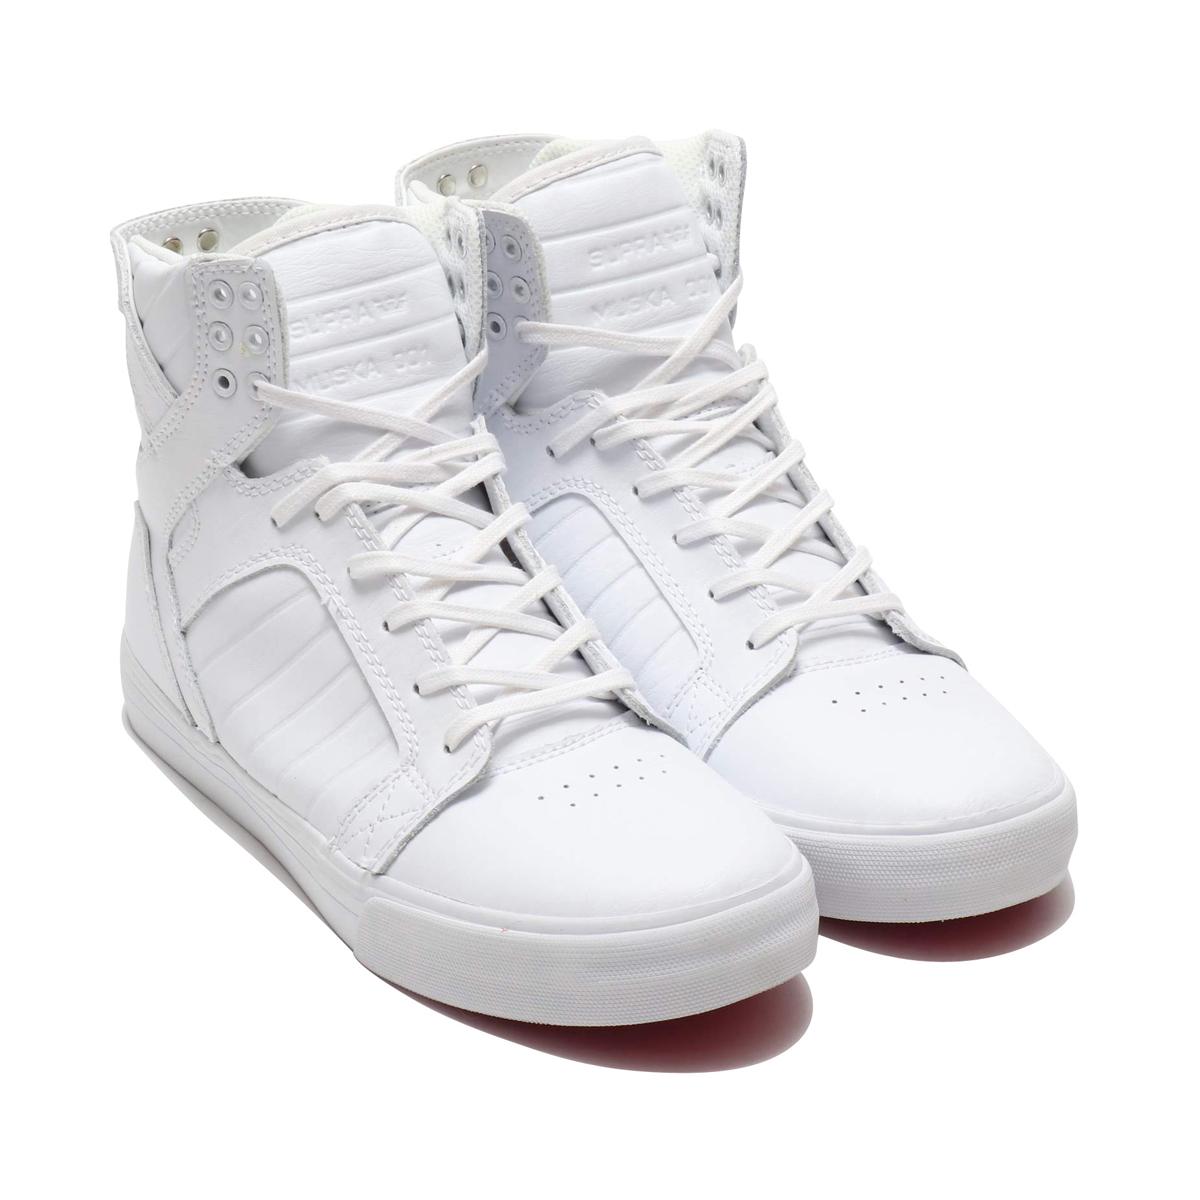 SUPRA SKYTOP CLASSICS (スープラ スカイトップ クラシックス)WHITE/WHITE-RED【メンズ スニーカー】CRYOVR